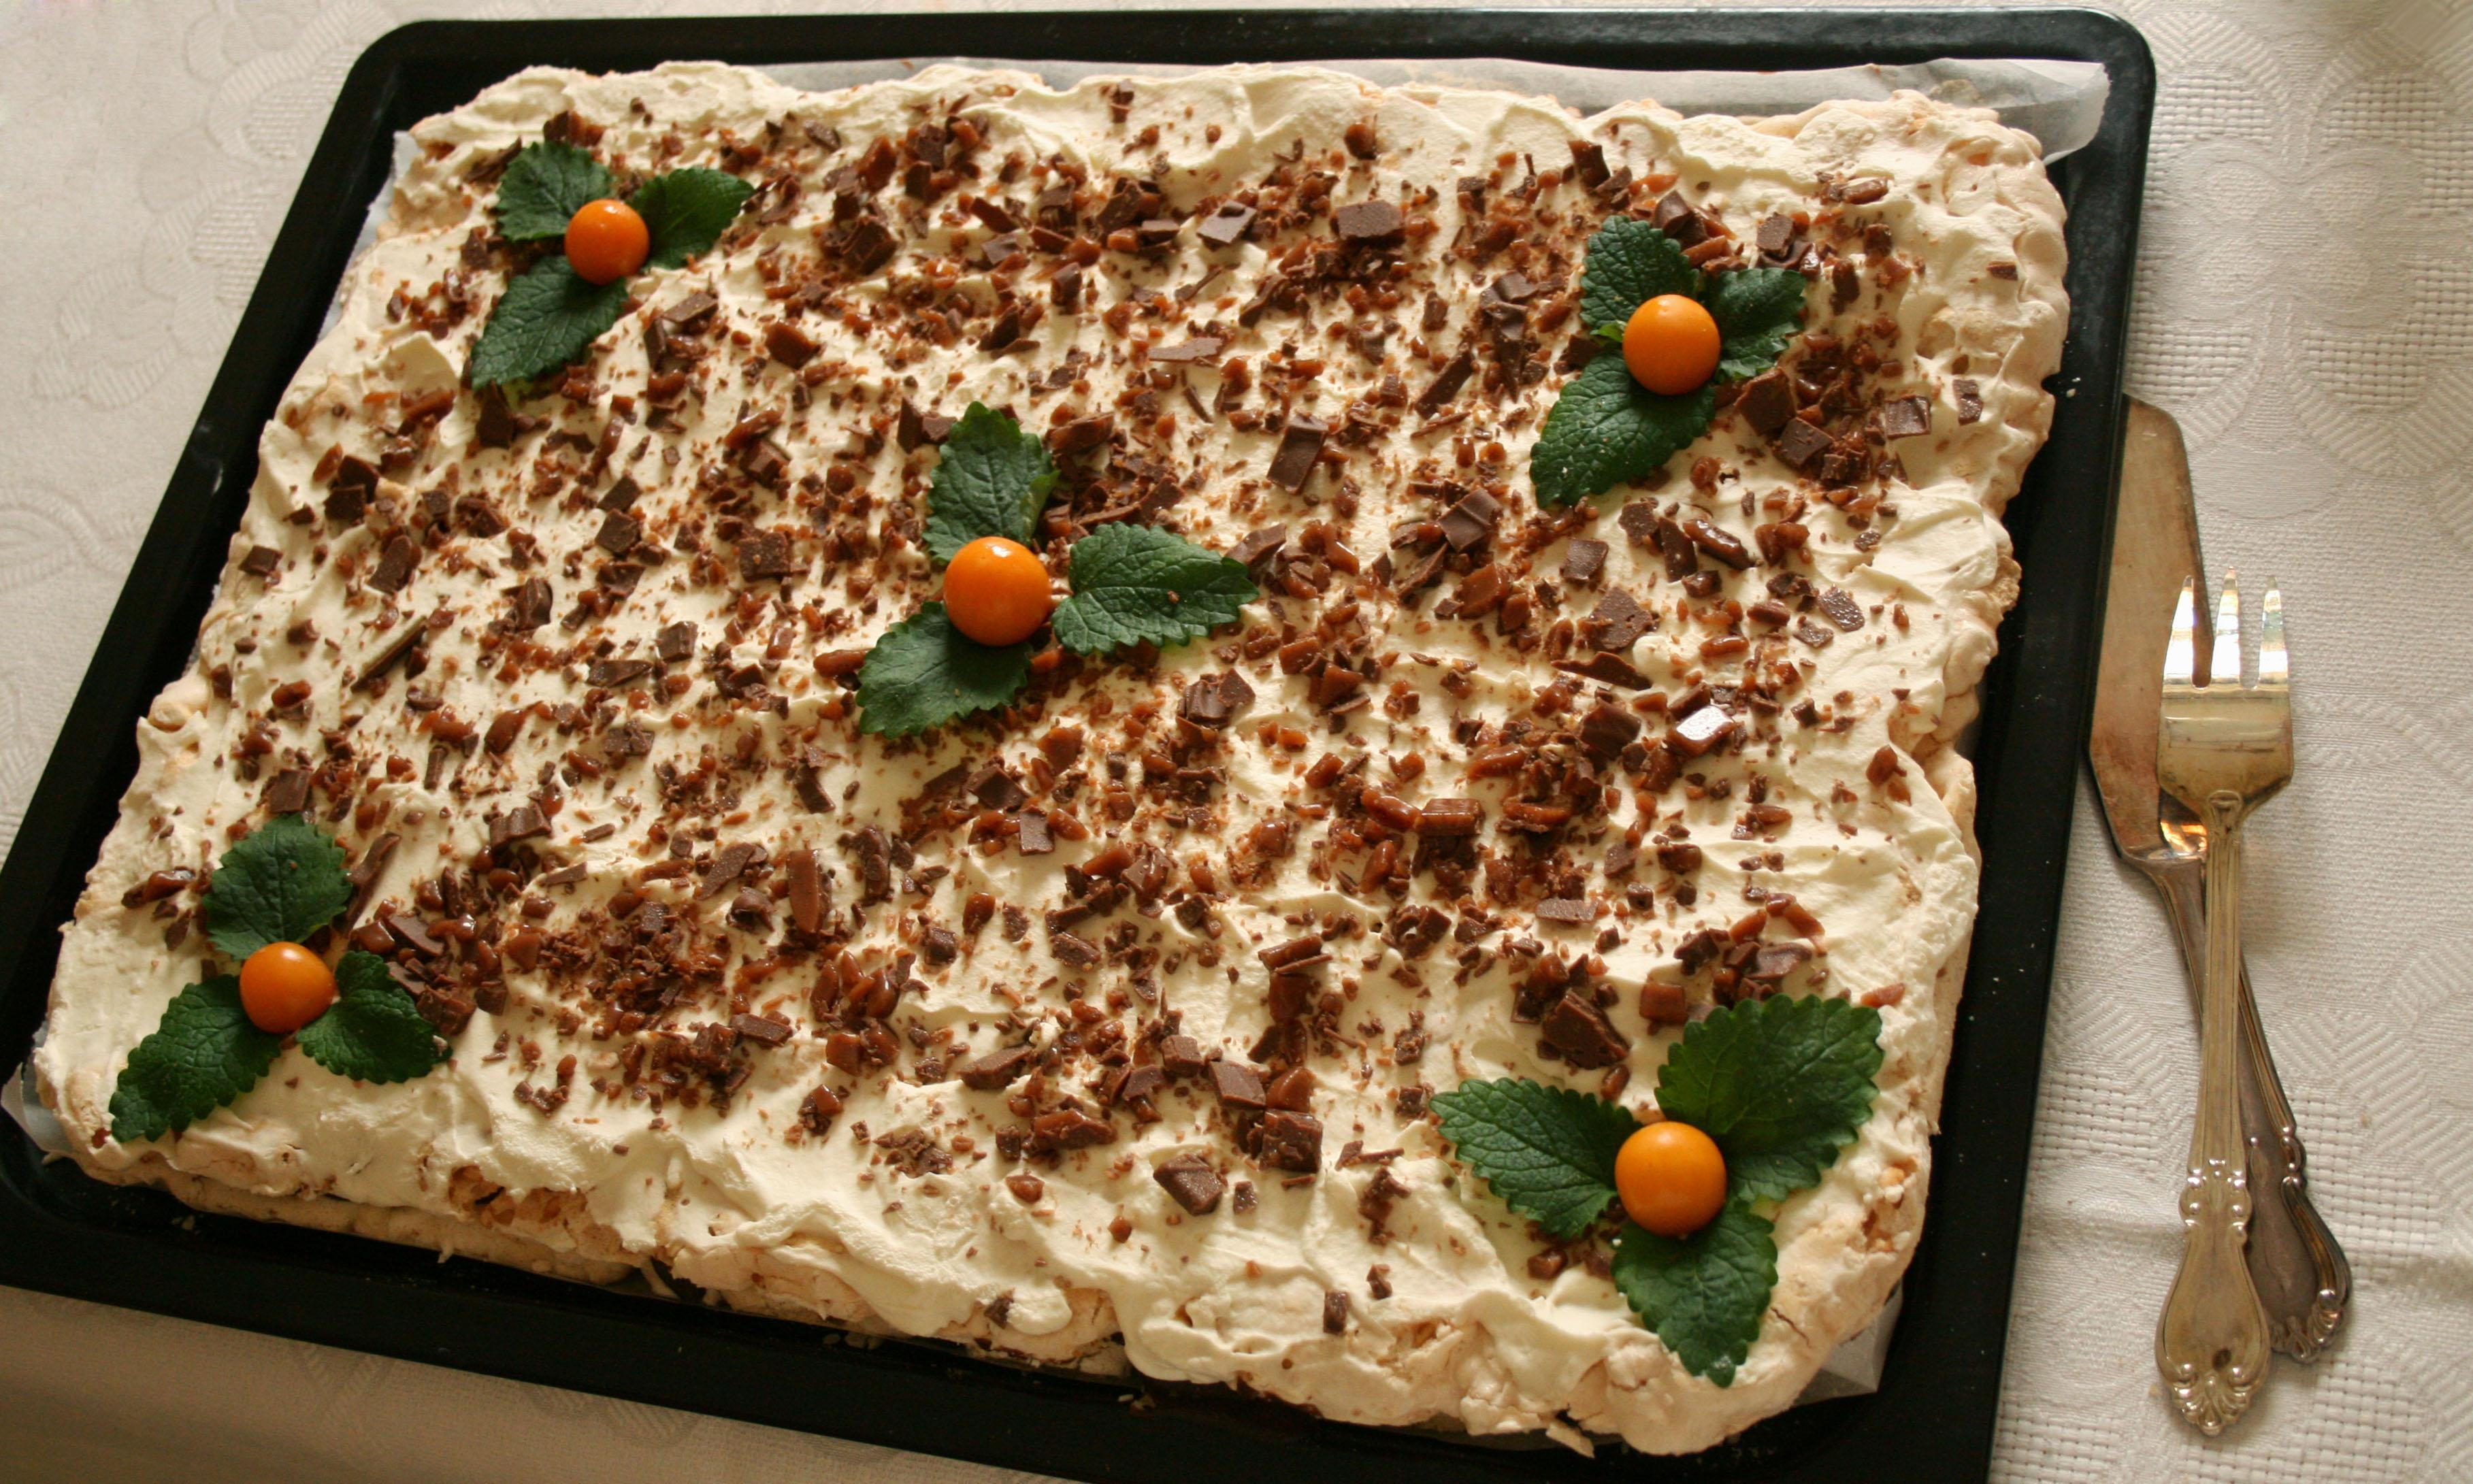 chokladsås till tårta